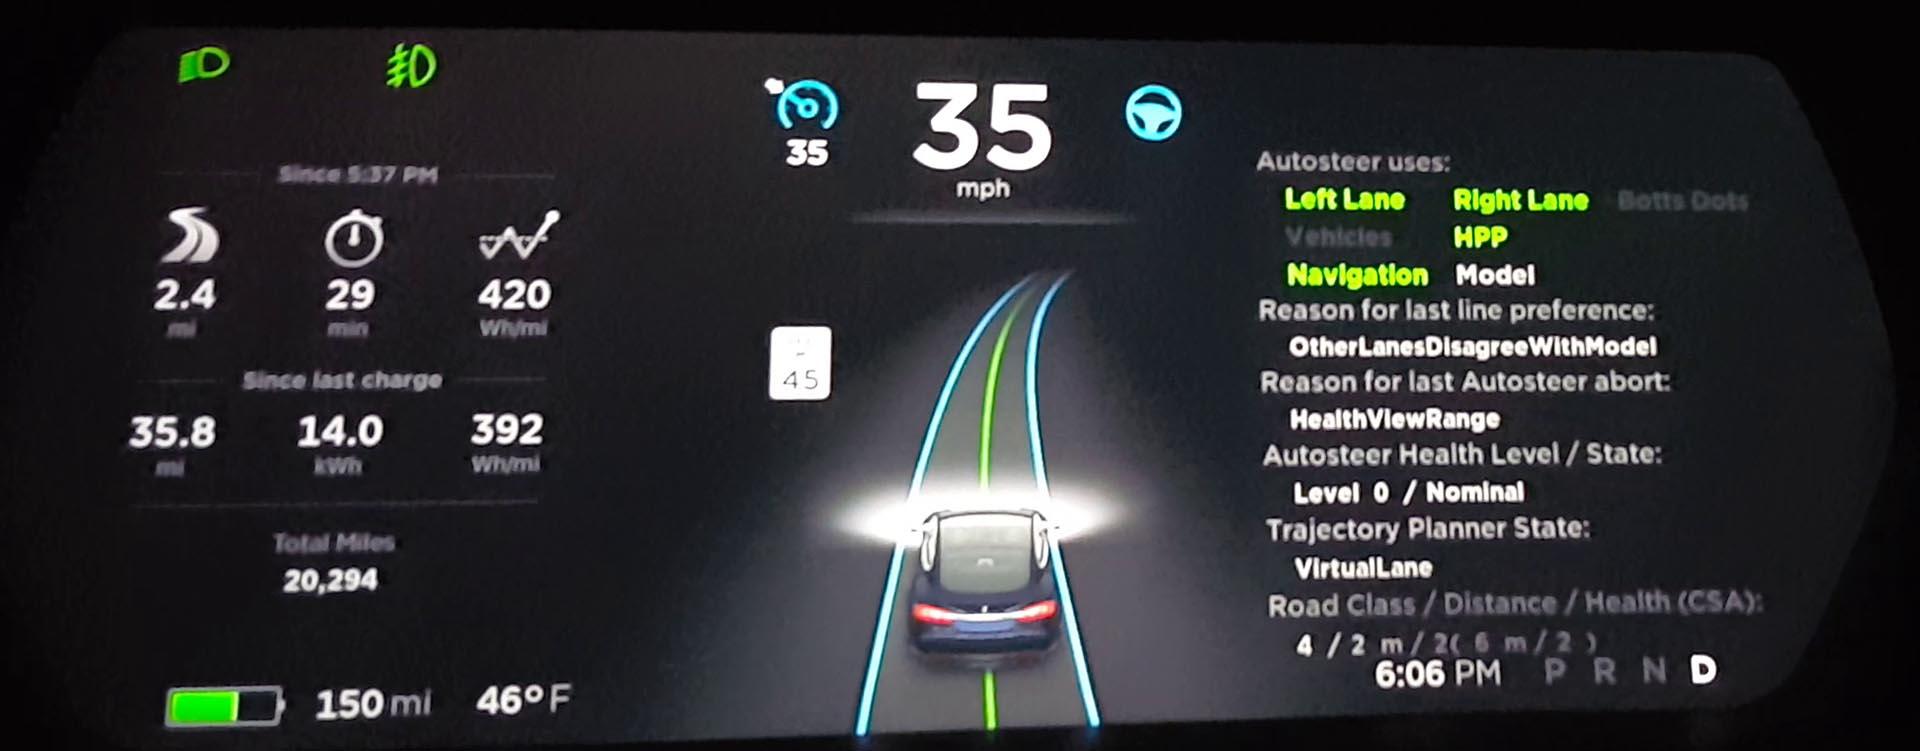 autopilot-debug.jpg